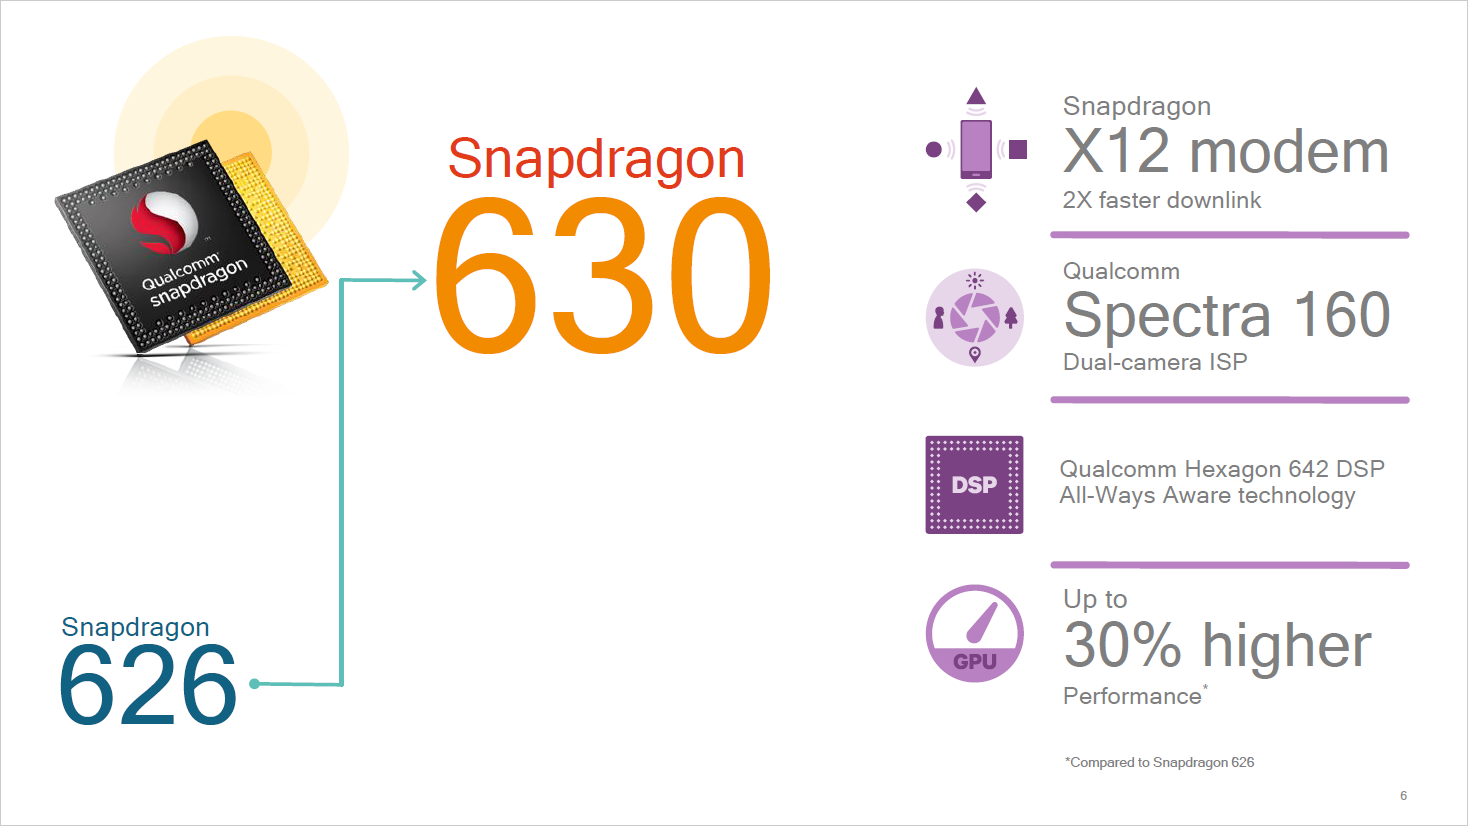 Snapdragon 660/630: Qualcomm bringt Kryo-Kerne in die Mittelklasse - SD630 im Detail (Bild: Qualcomm)